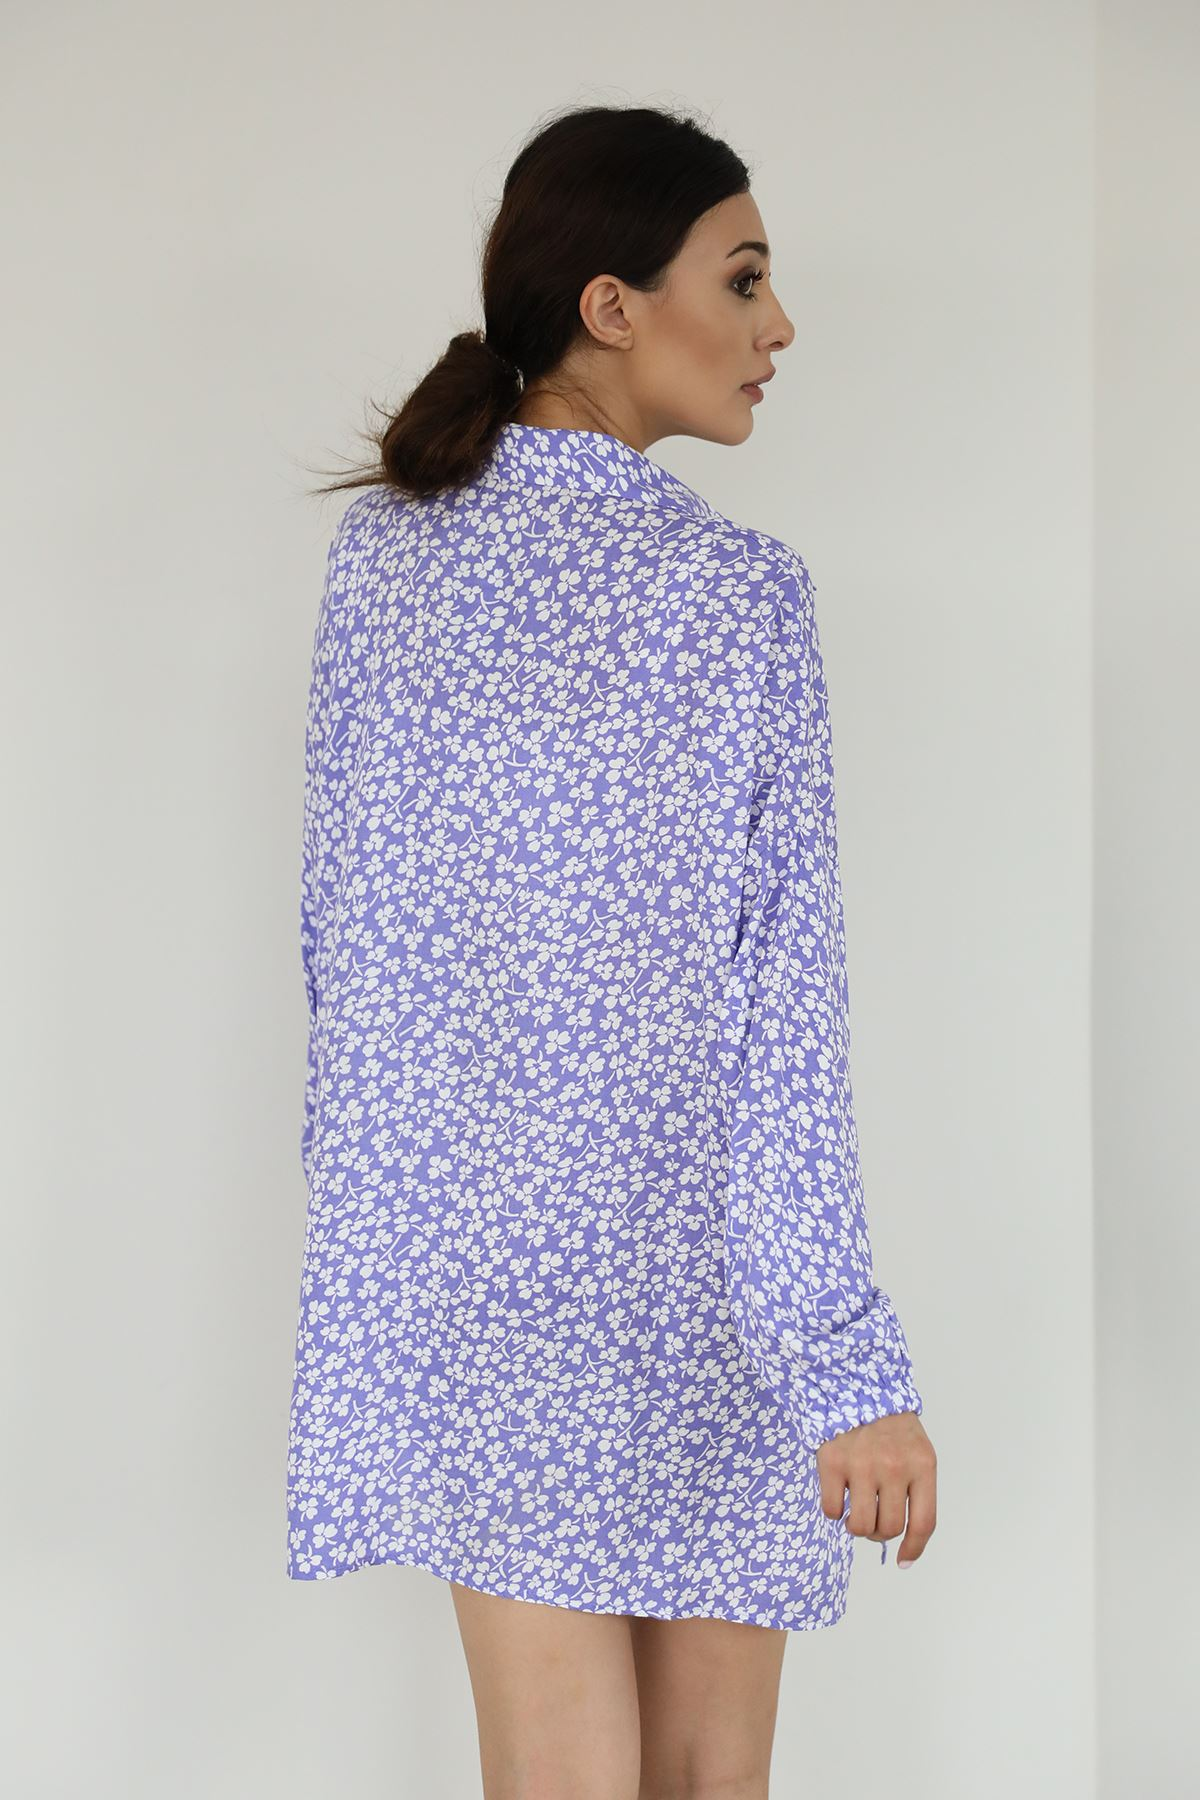 Yonca Desen Gömlek-Lila